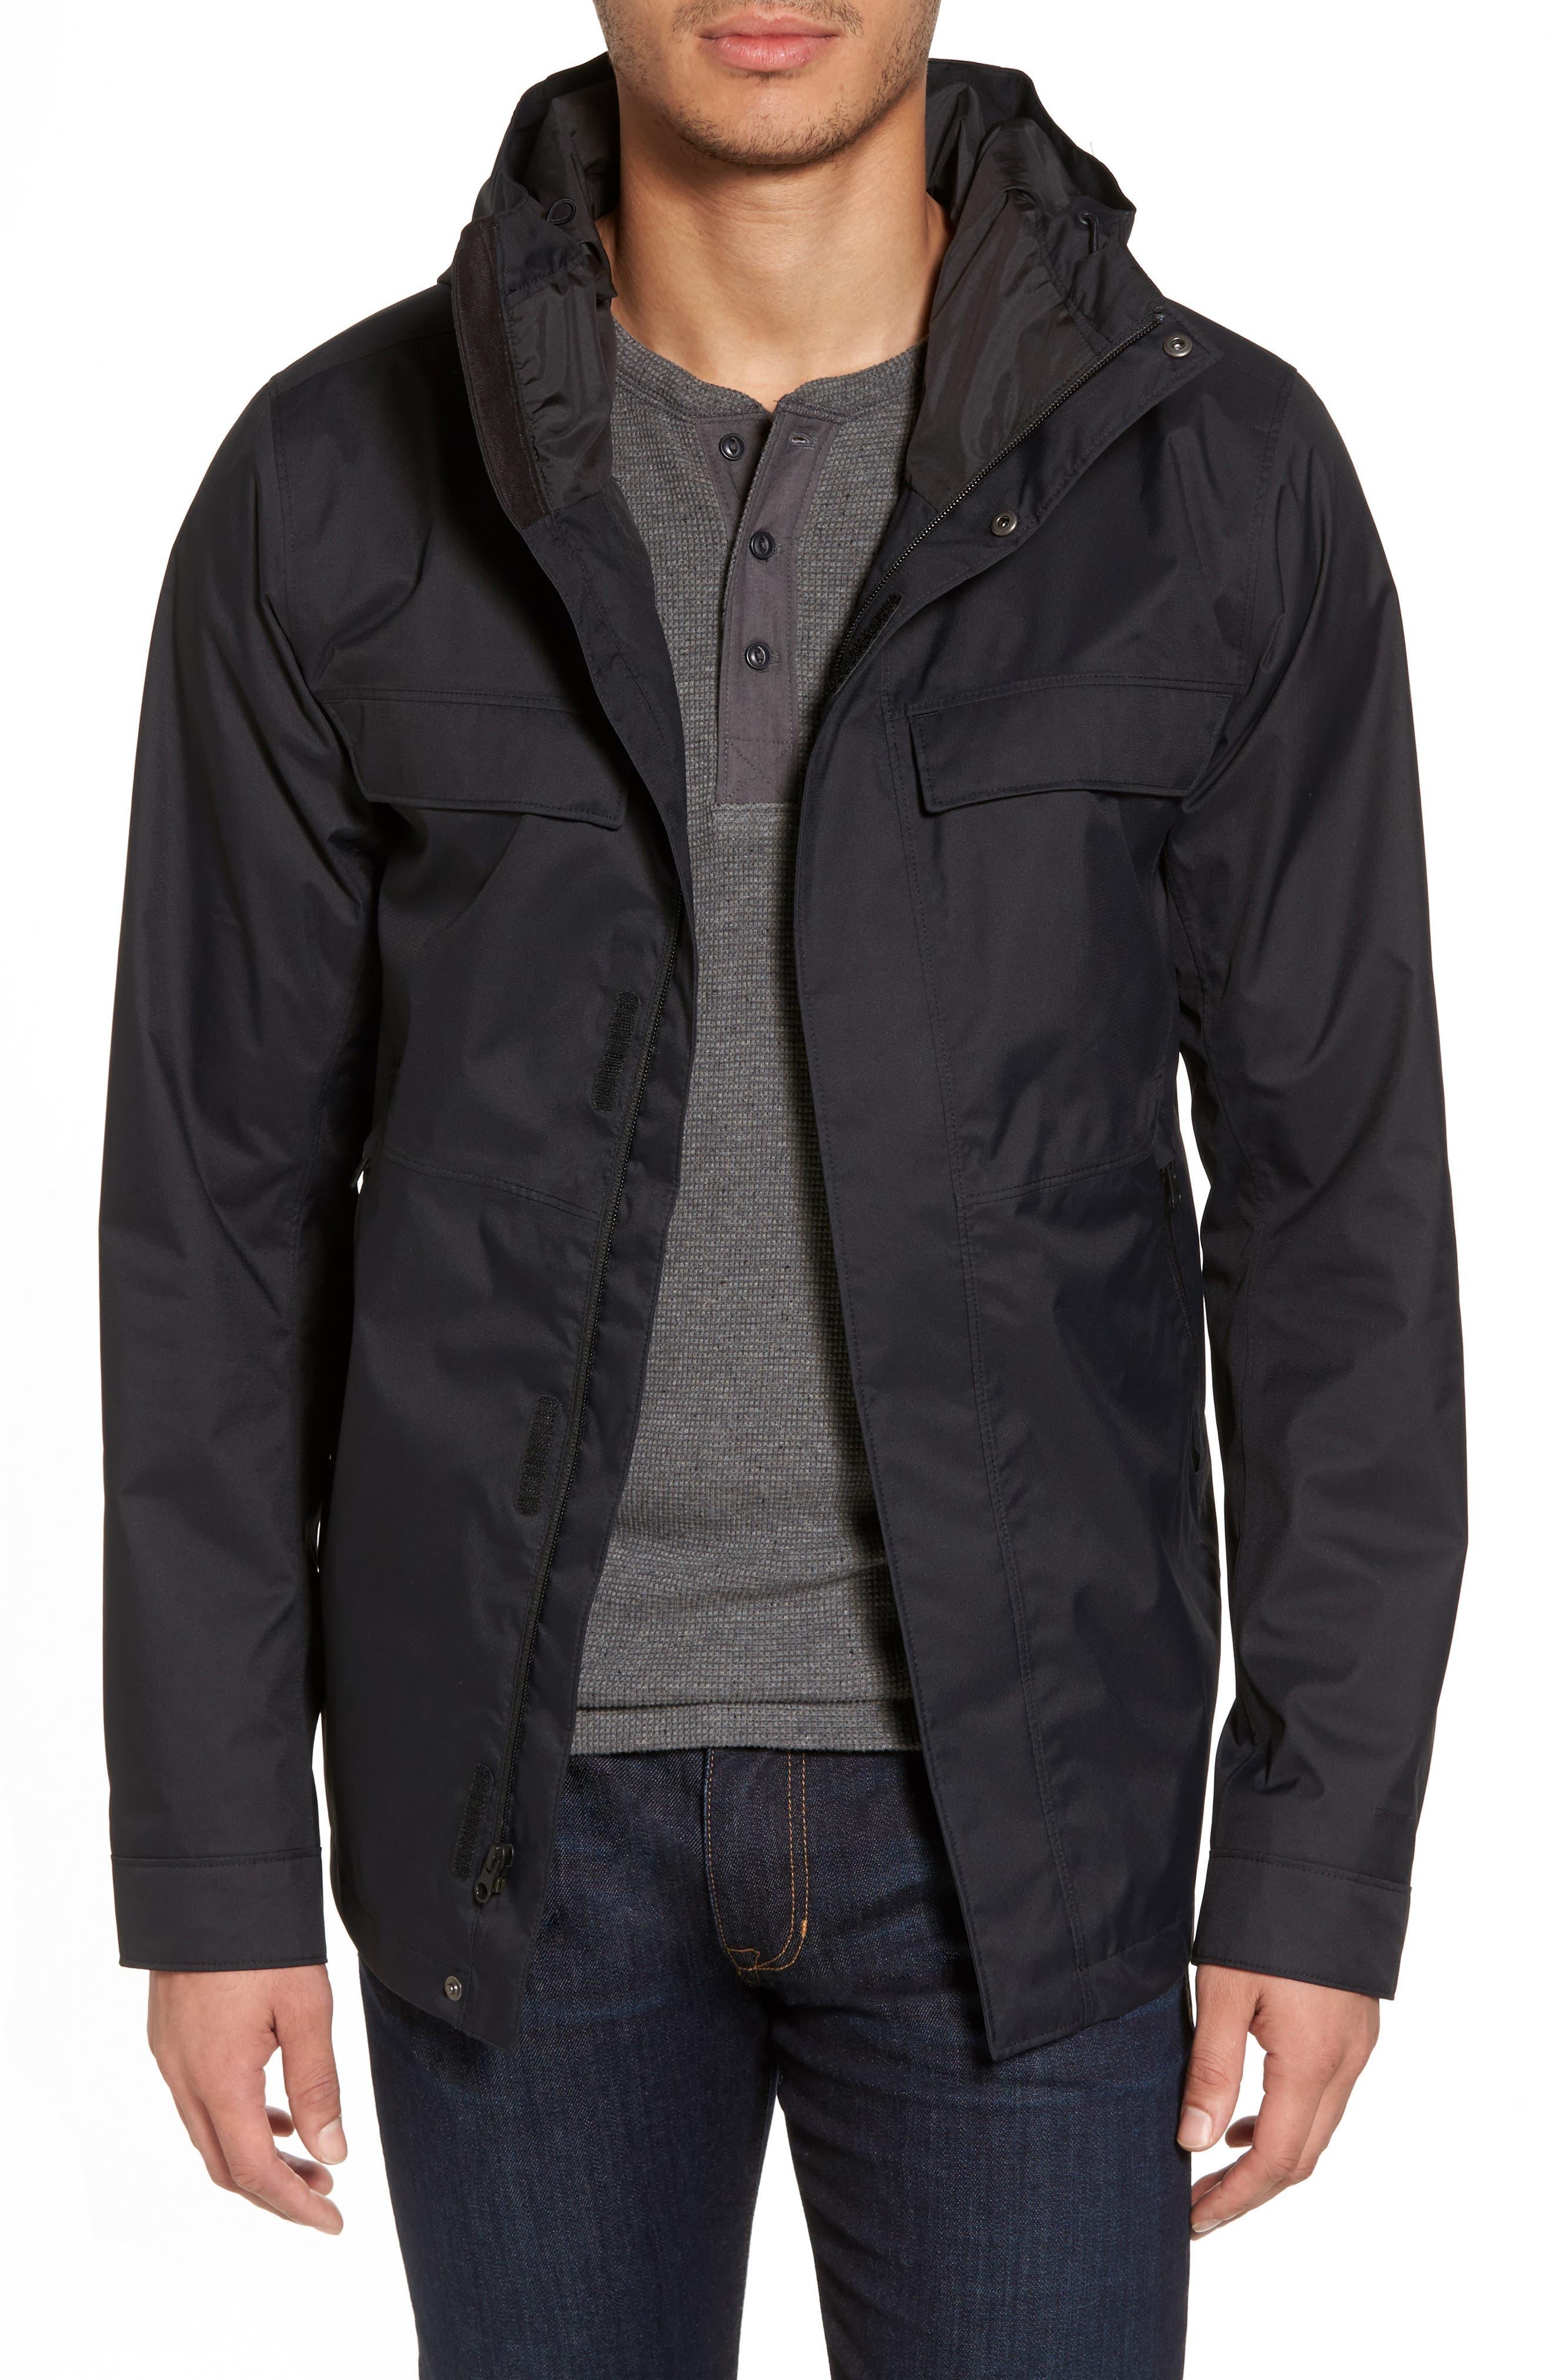 Jenison II Insulated Waterproof Jacket,                         Main,                         color, 001